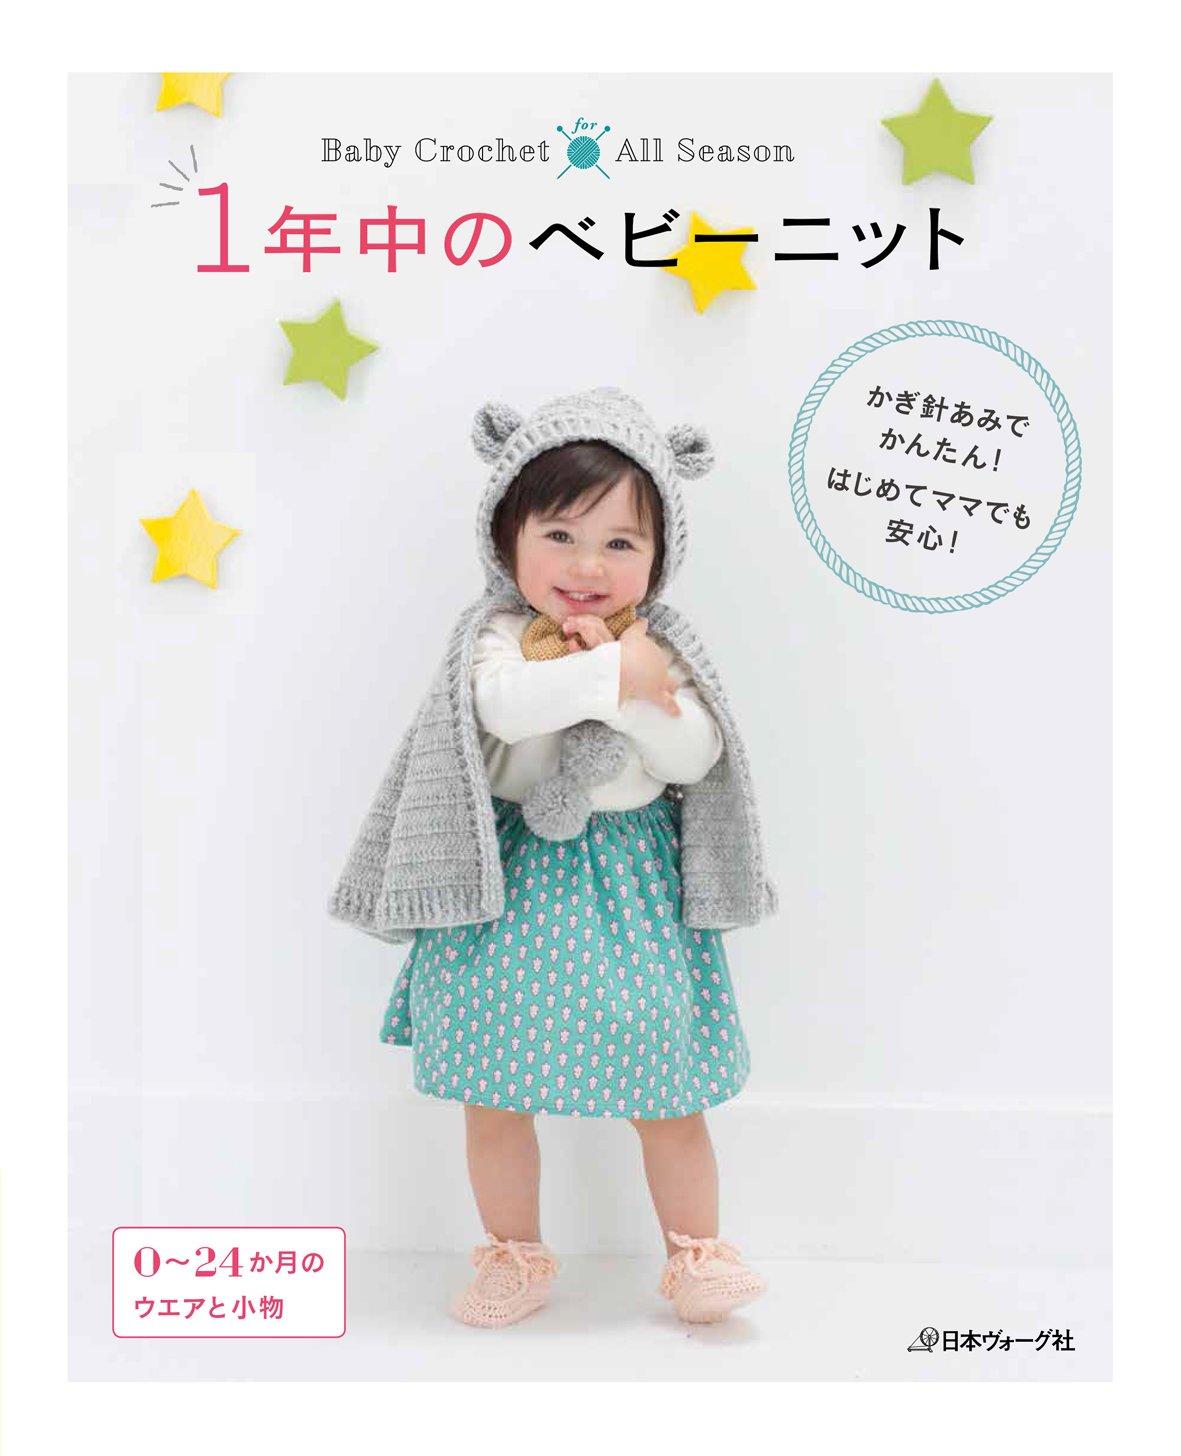 Baby knit year round